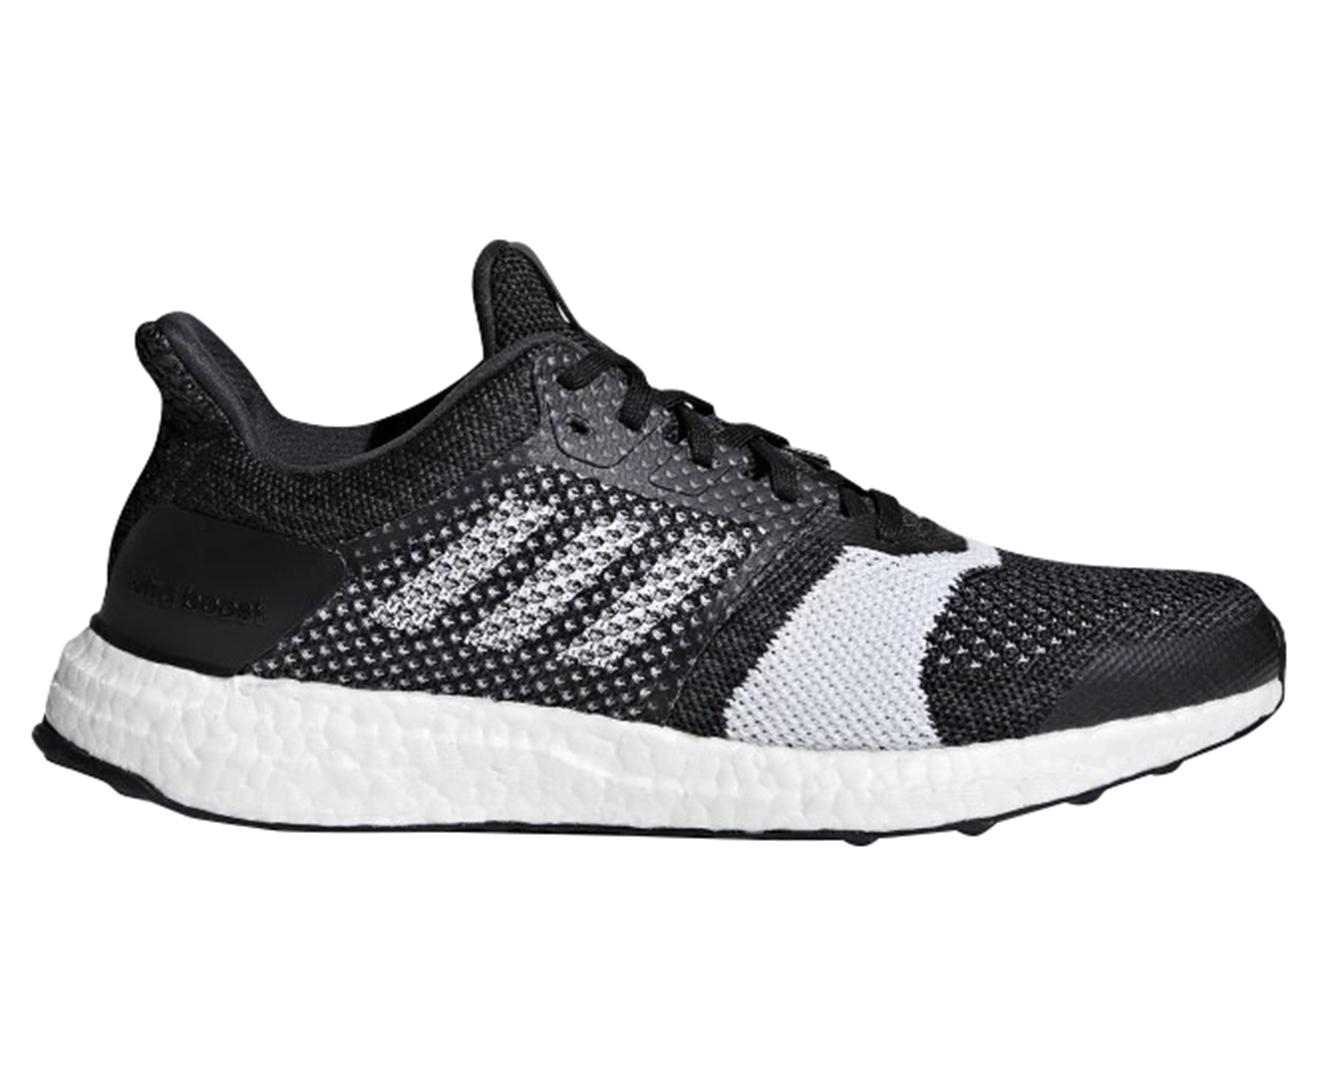 Adidas Primeknit 2.0 Boost Street website